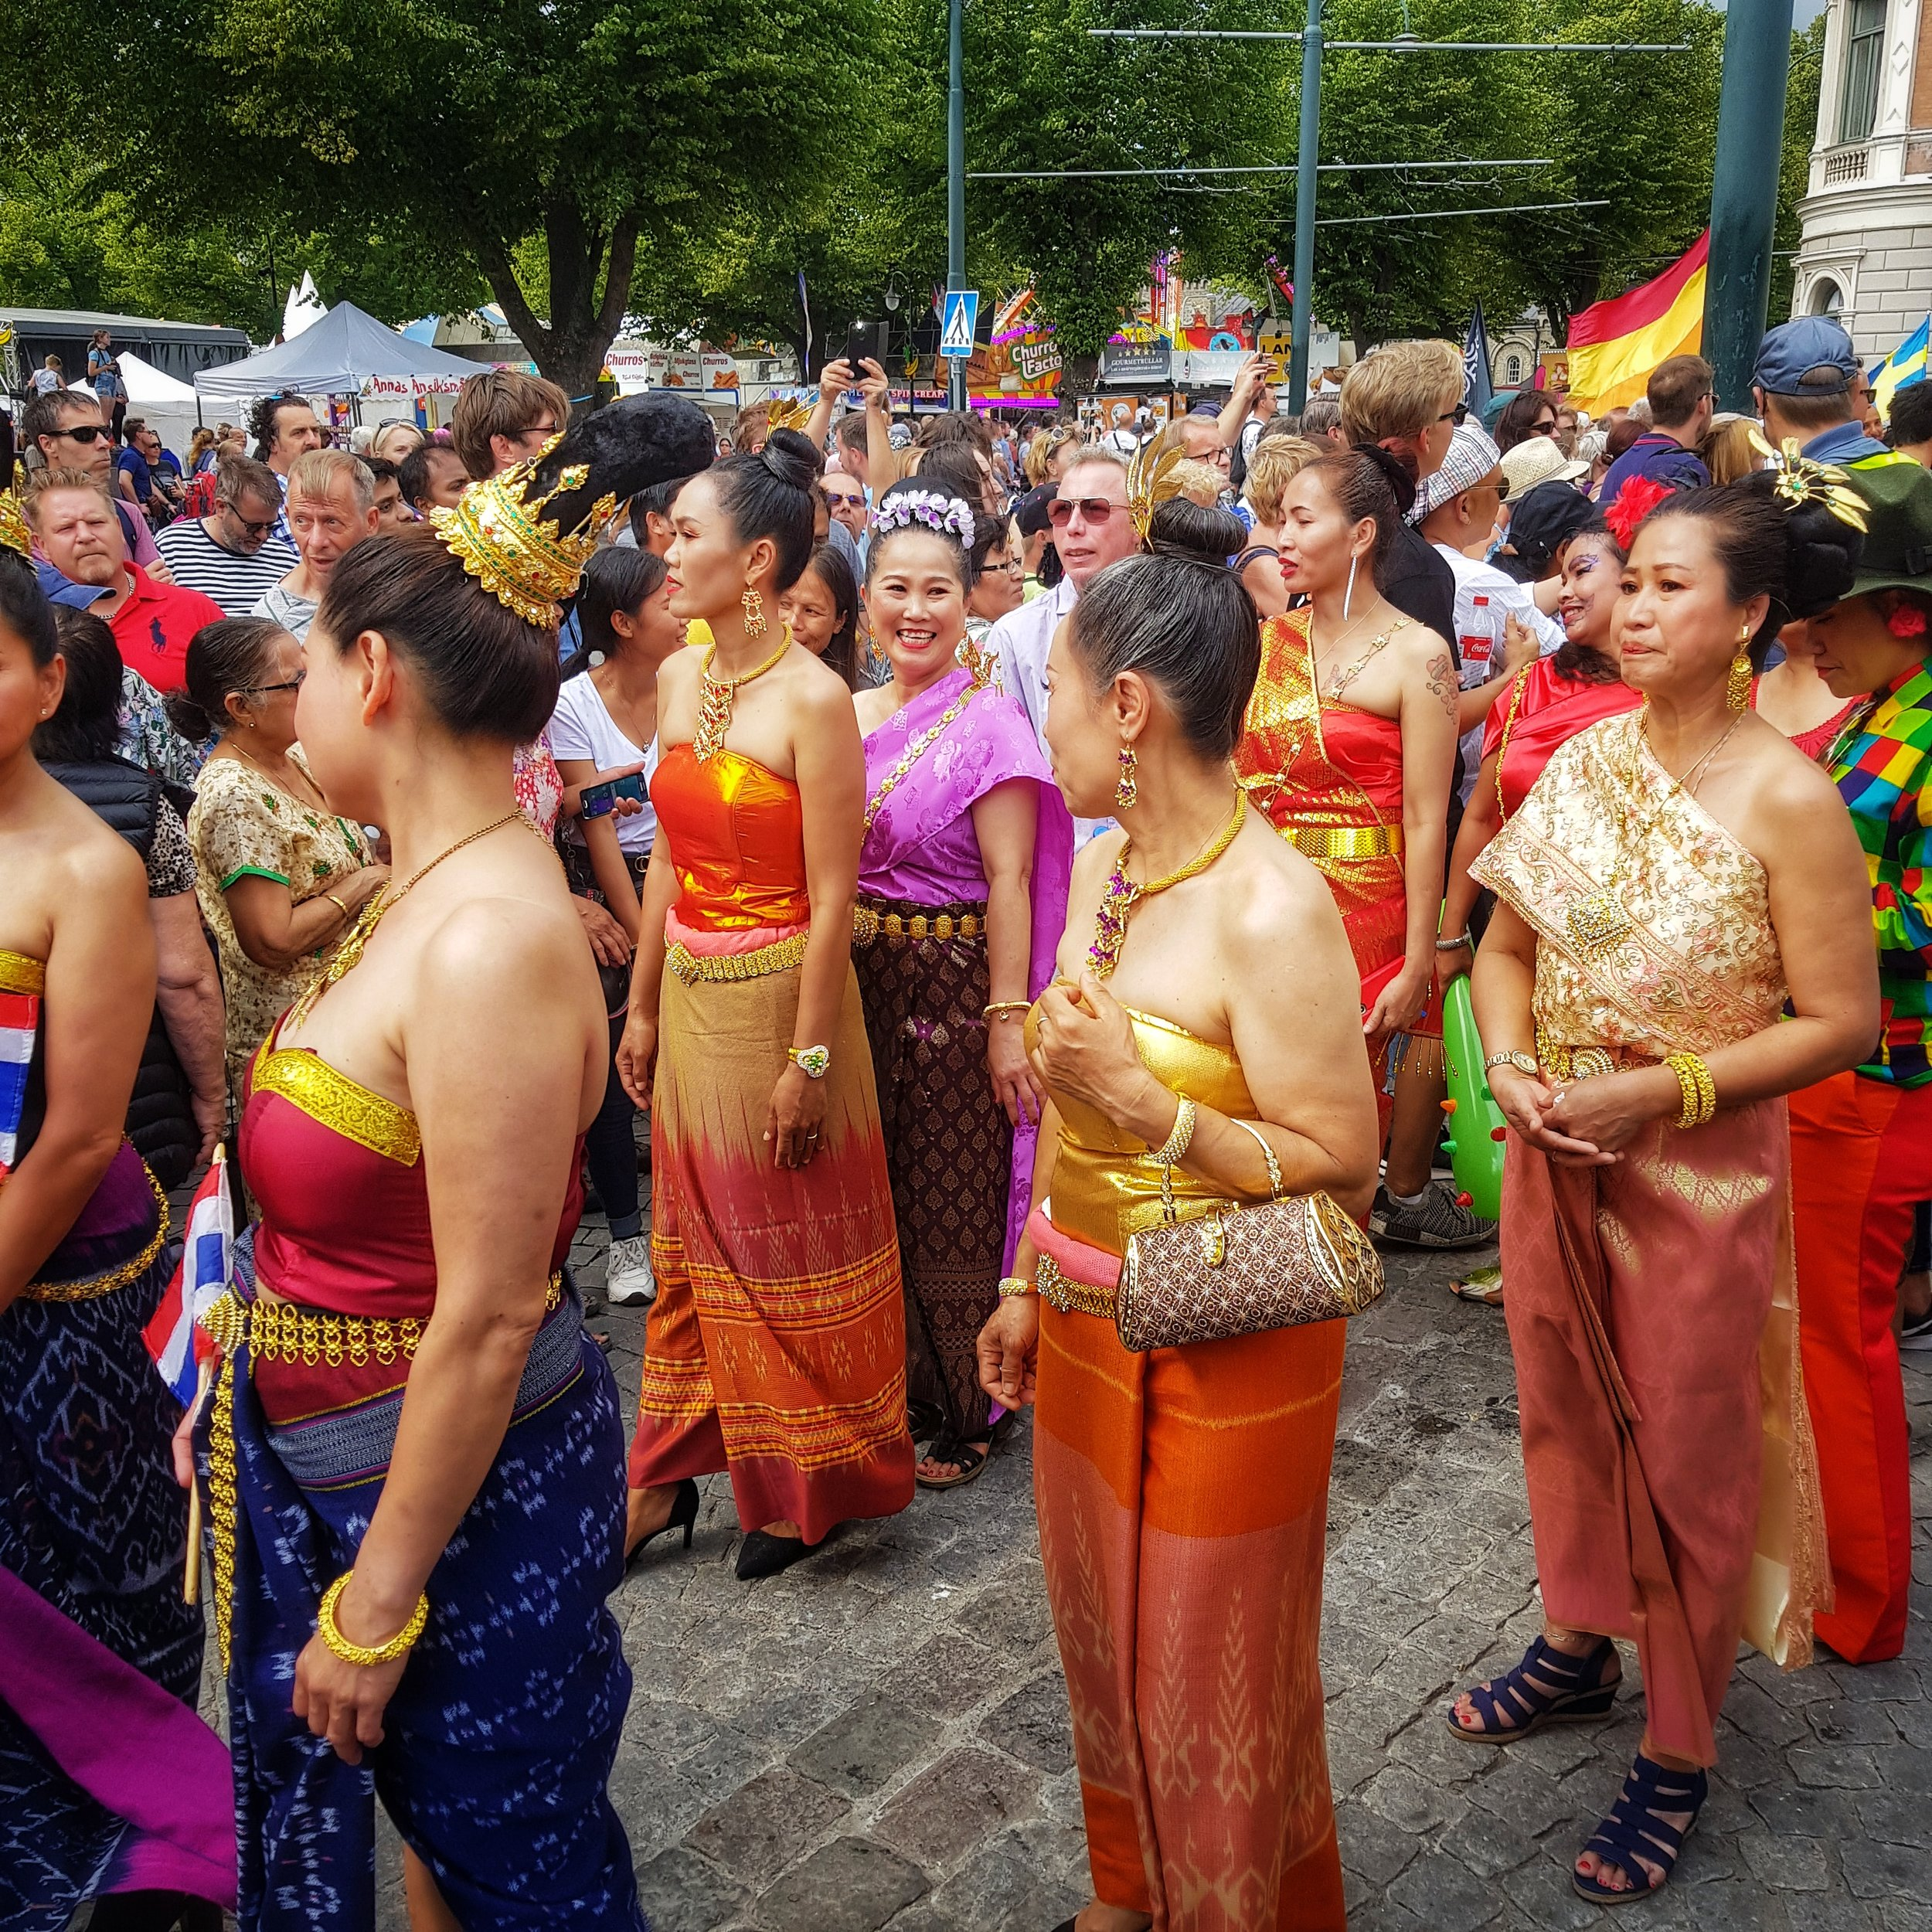 Day 208 - July 27: Carnival Parade